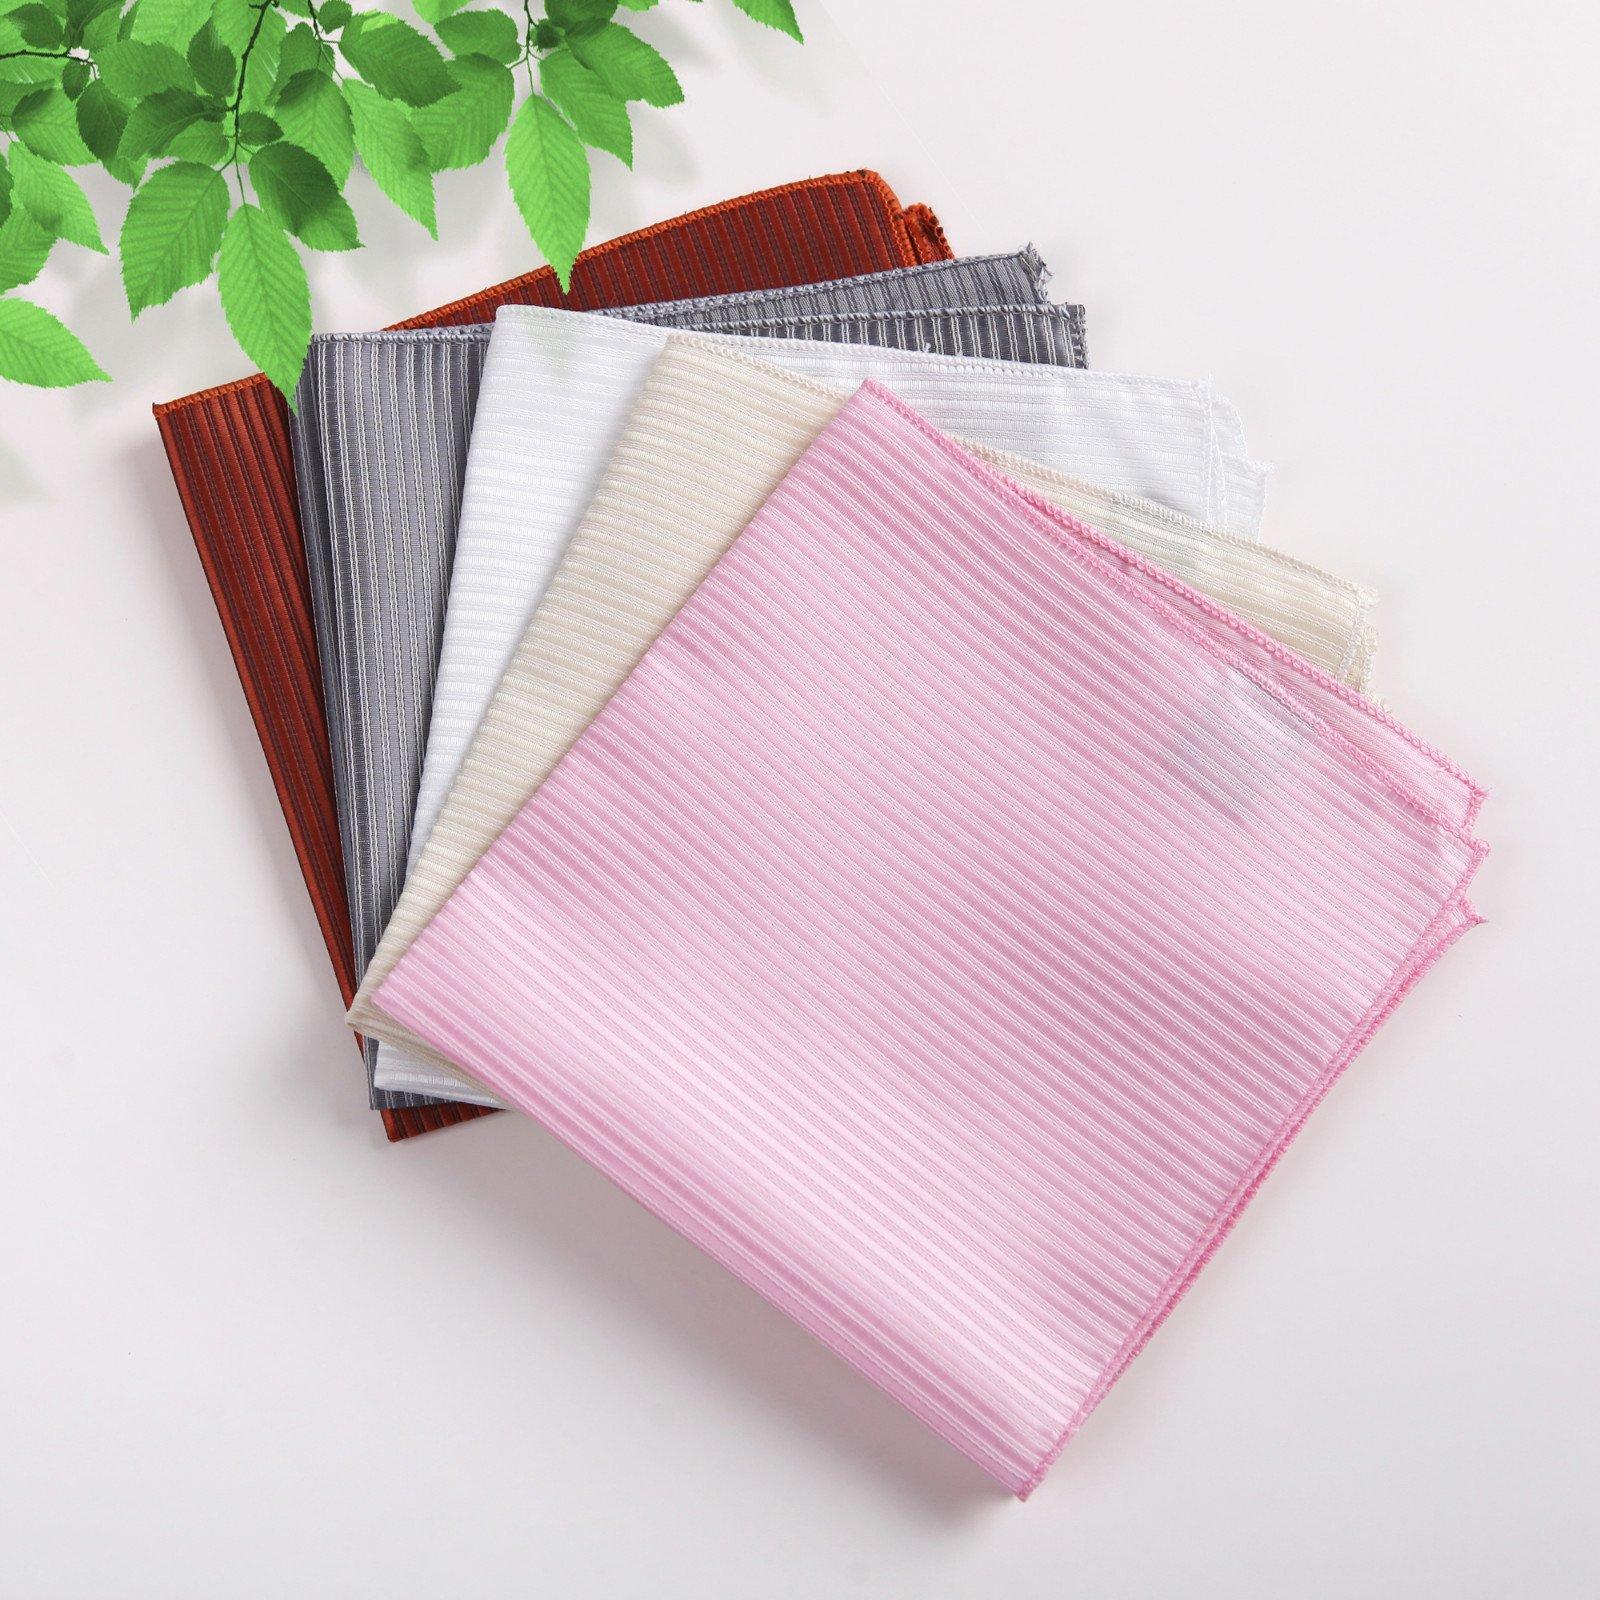 DEIA0004 Designer Stripes Microfiber Birthday Gifts for Mens Hanky Set 5 Hankerchiefs Set-Pink, Dark Orange, Grey, Beige, White By Dan Smith by Dan Smith (Image #2)